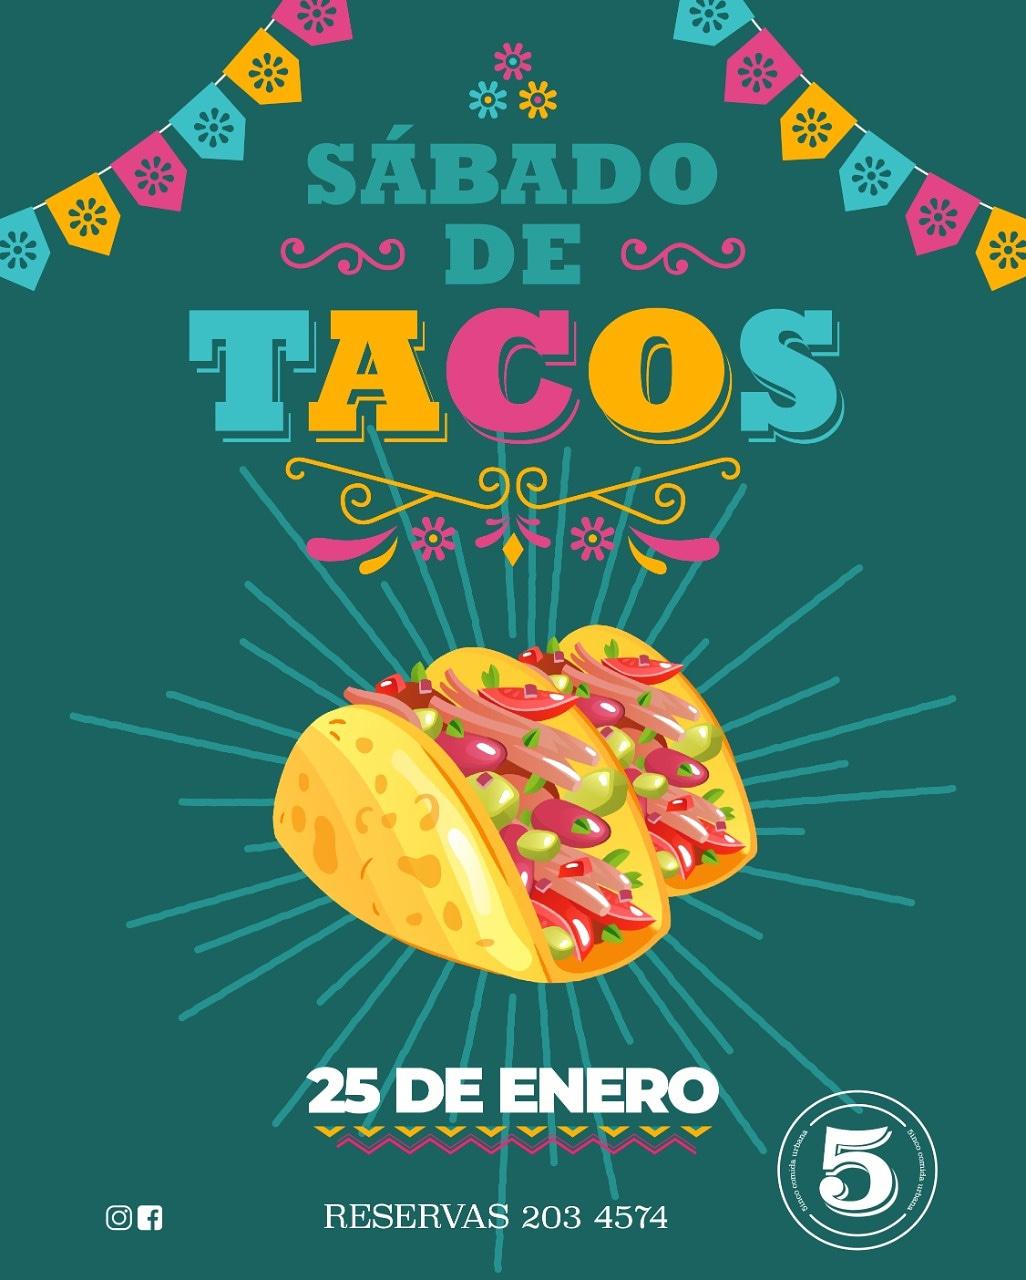 5inco Taco night